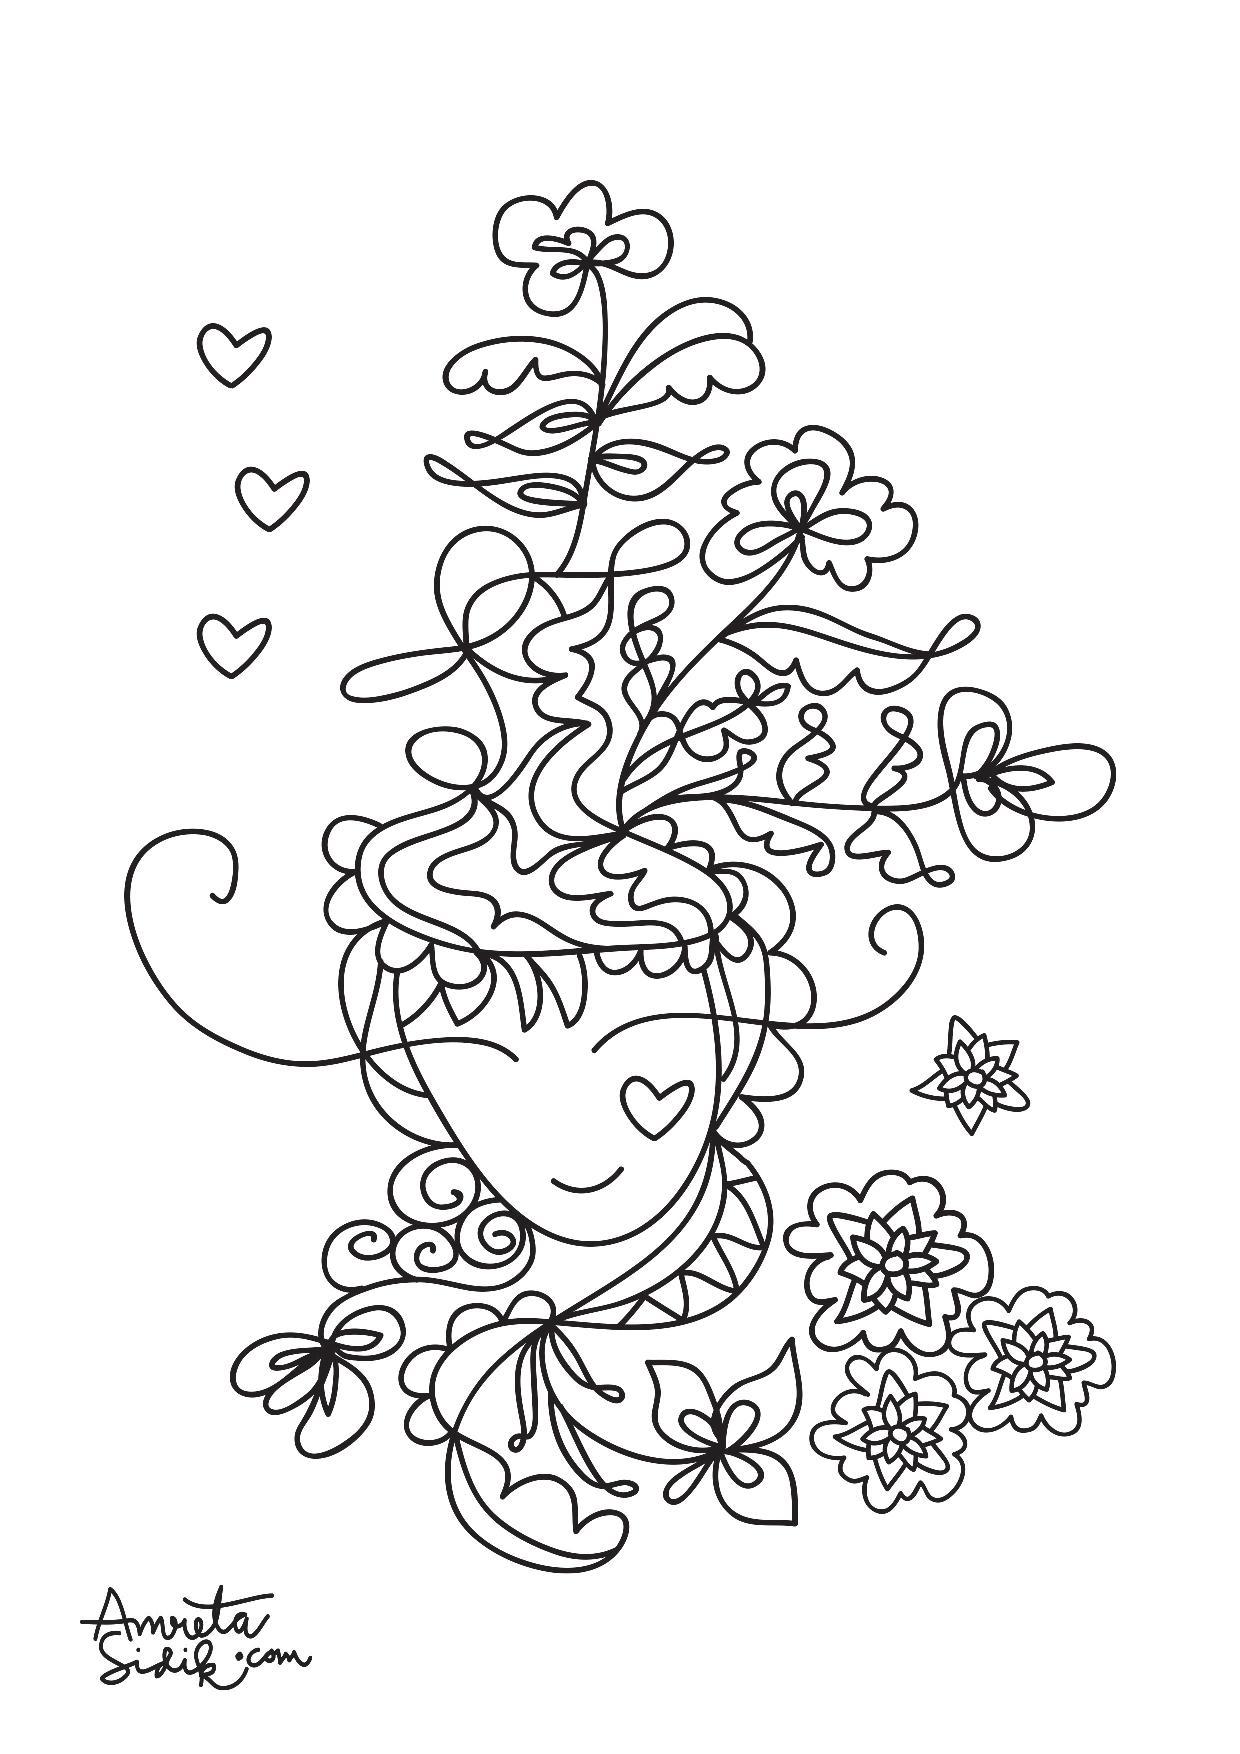 Fille aux fleurs 1A partir de la galerie : Anti StressArtiste : Amreta Sidik